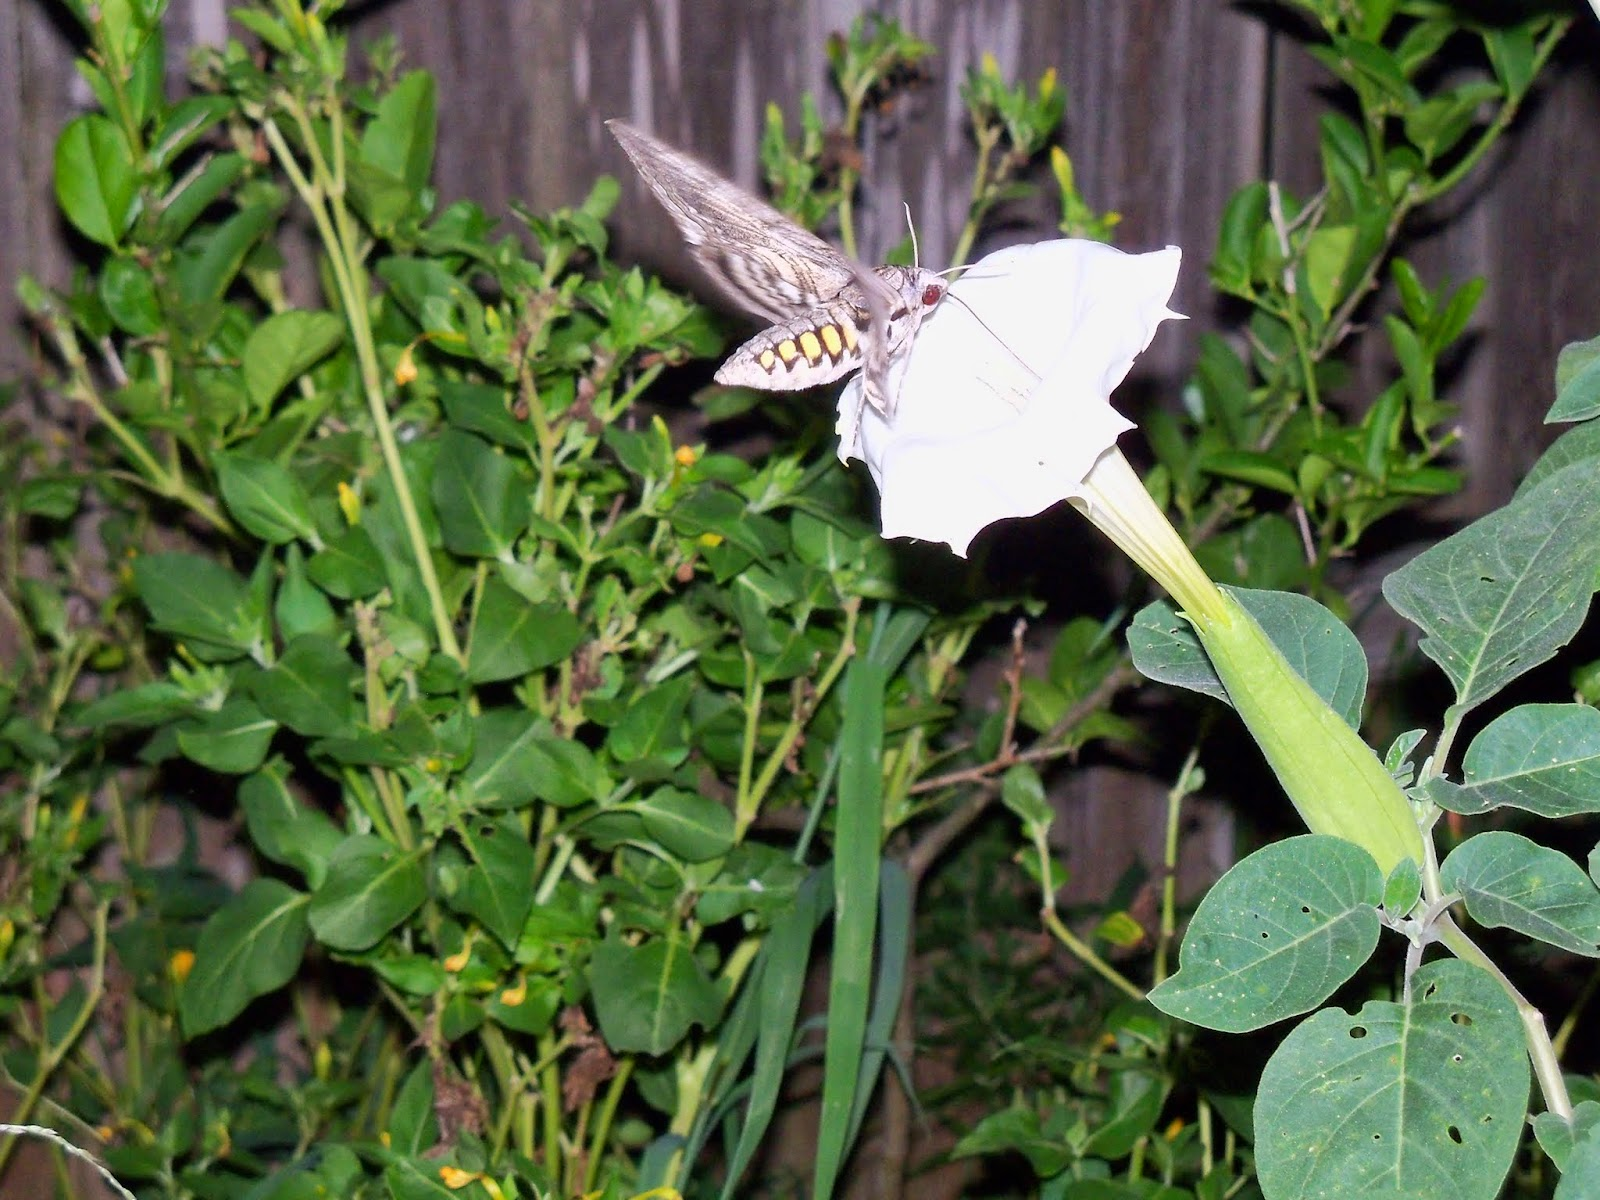 Gardening 2014 - 116_3596.JPG